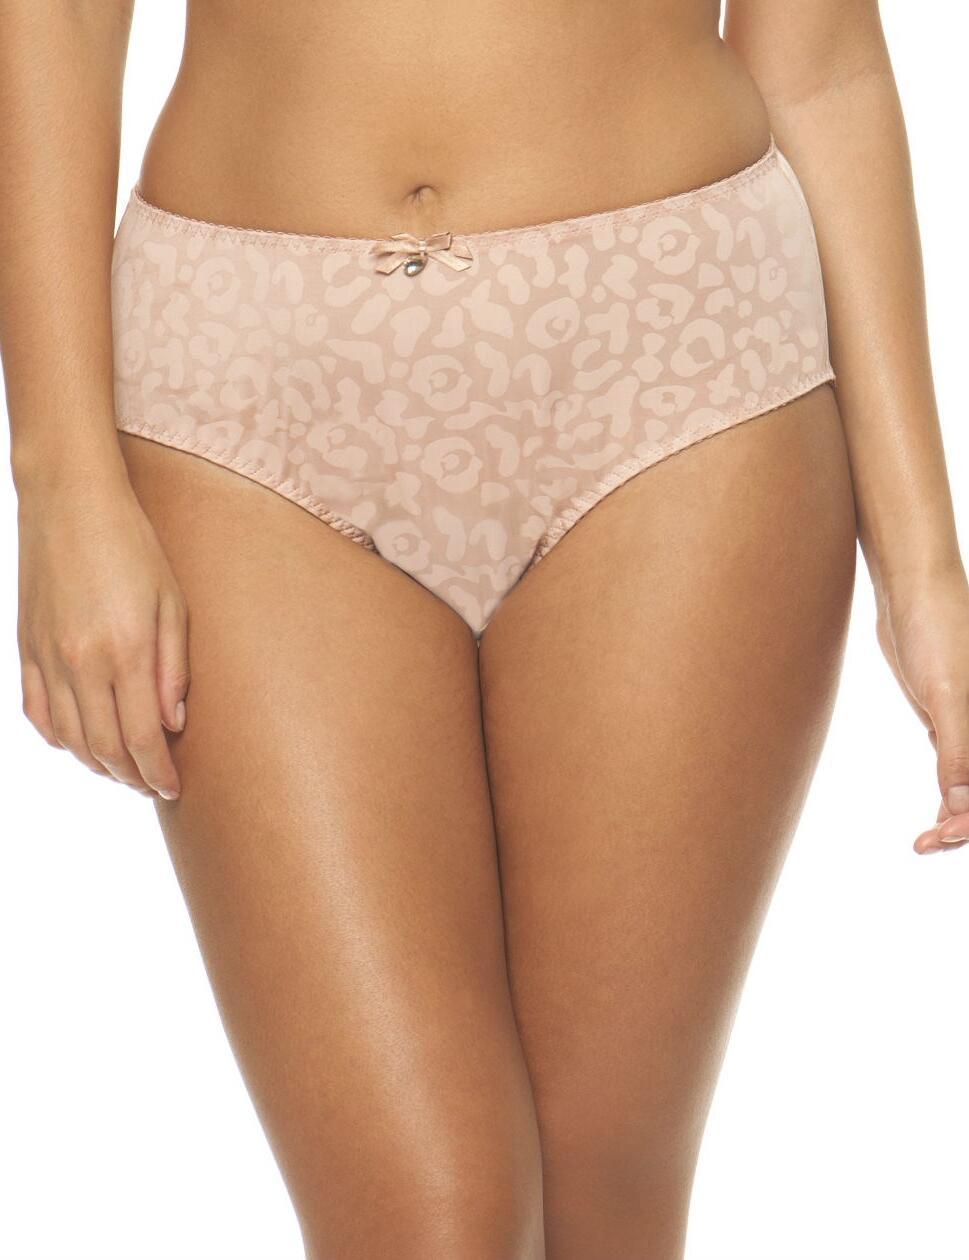 Curvy Kate Smoothie : shaper brief 50% off - Blush